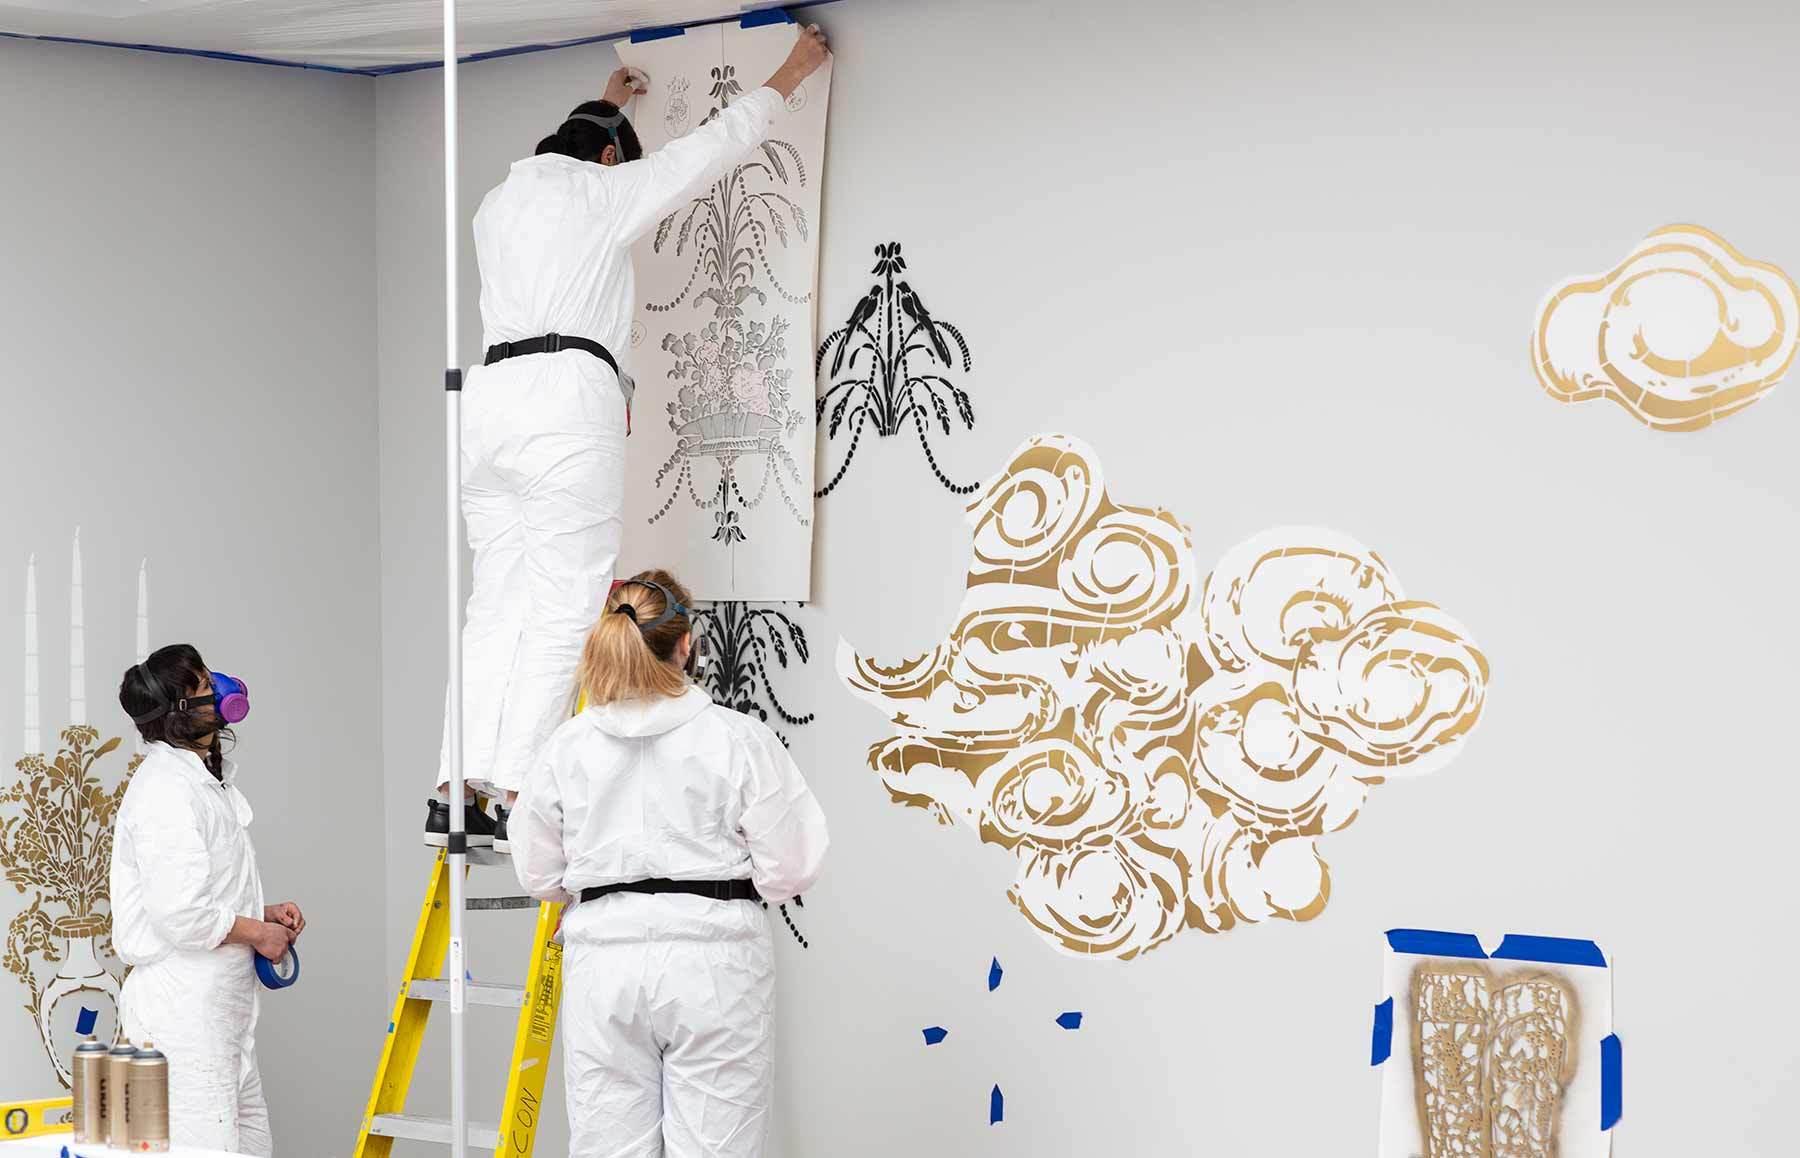 Vanessa Platacis installs Taking Place